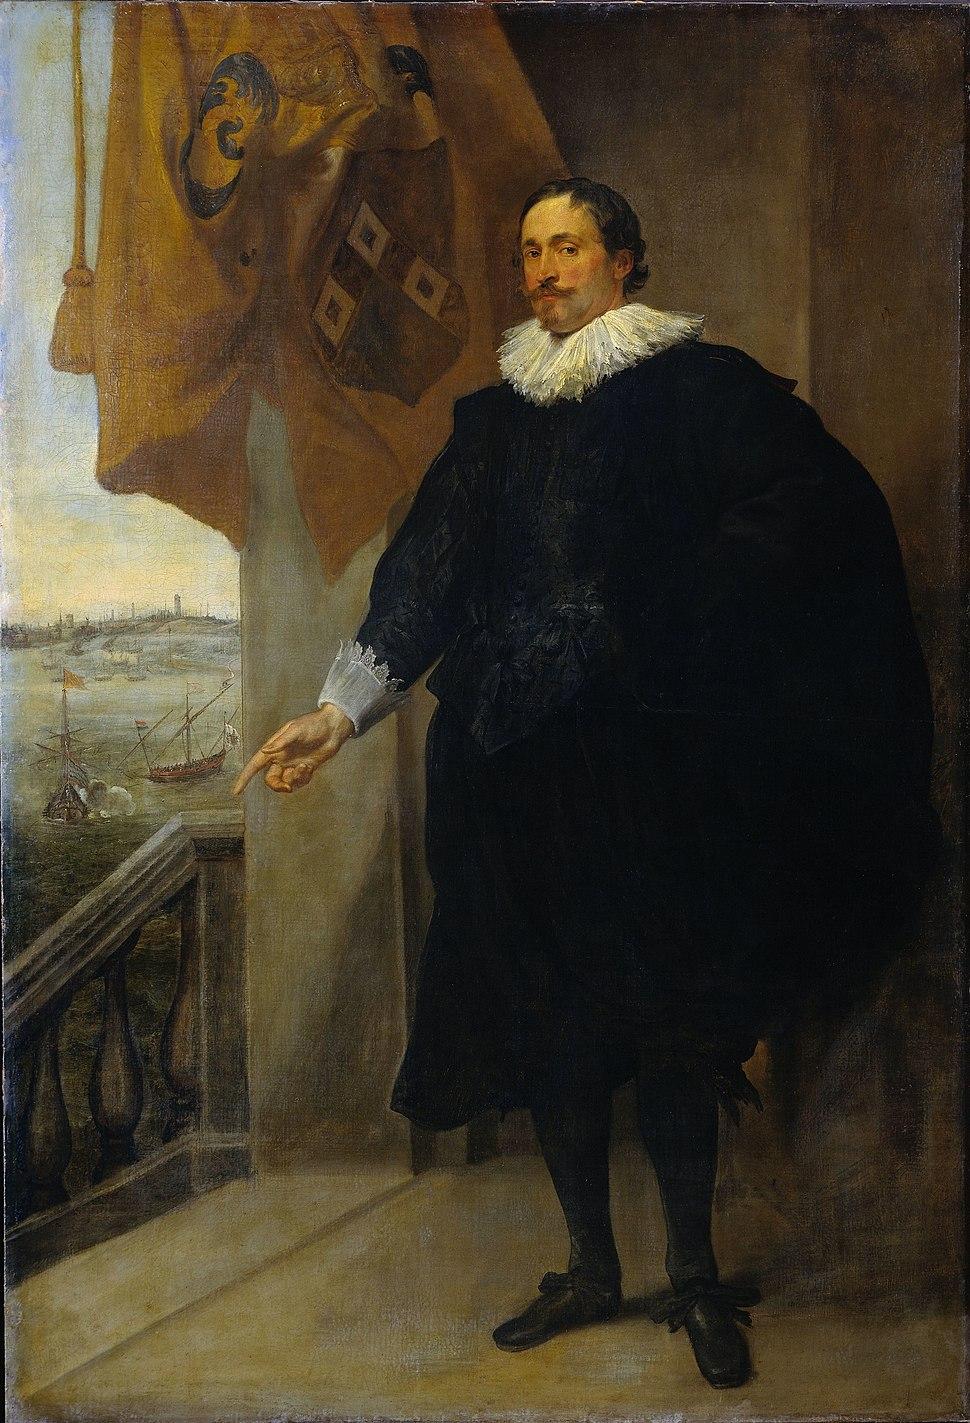 A. van Dyck Portrait of Nicolaes van der Borght 1625-1635